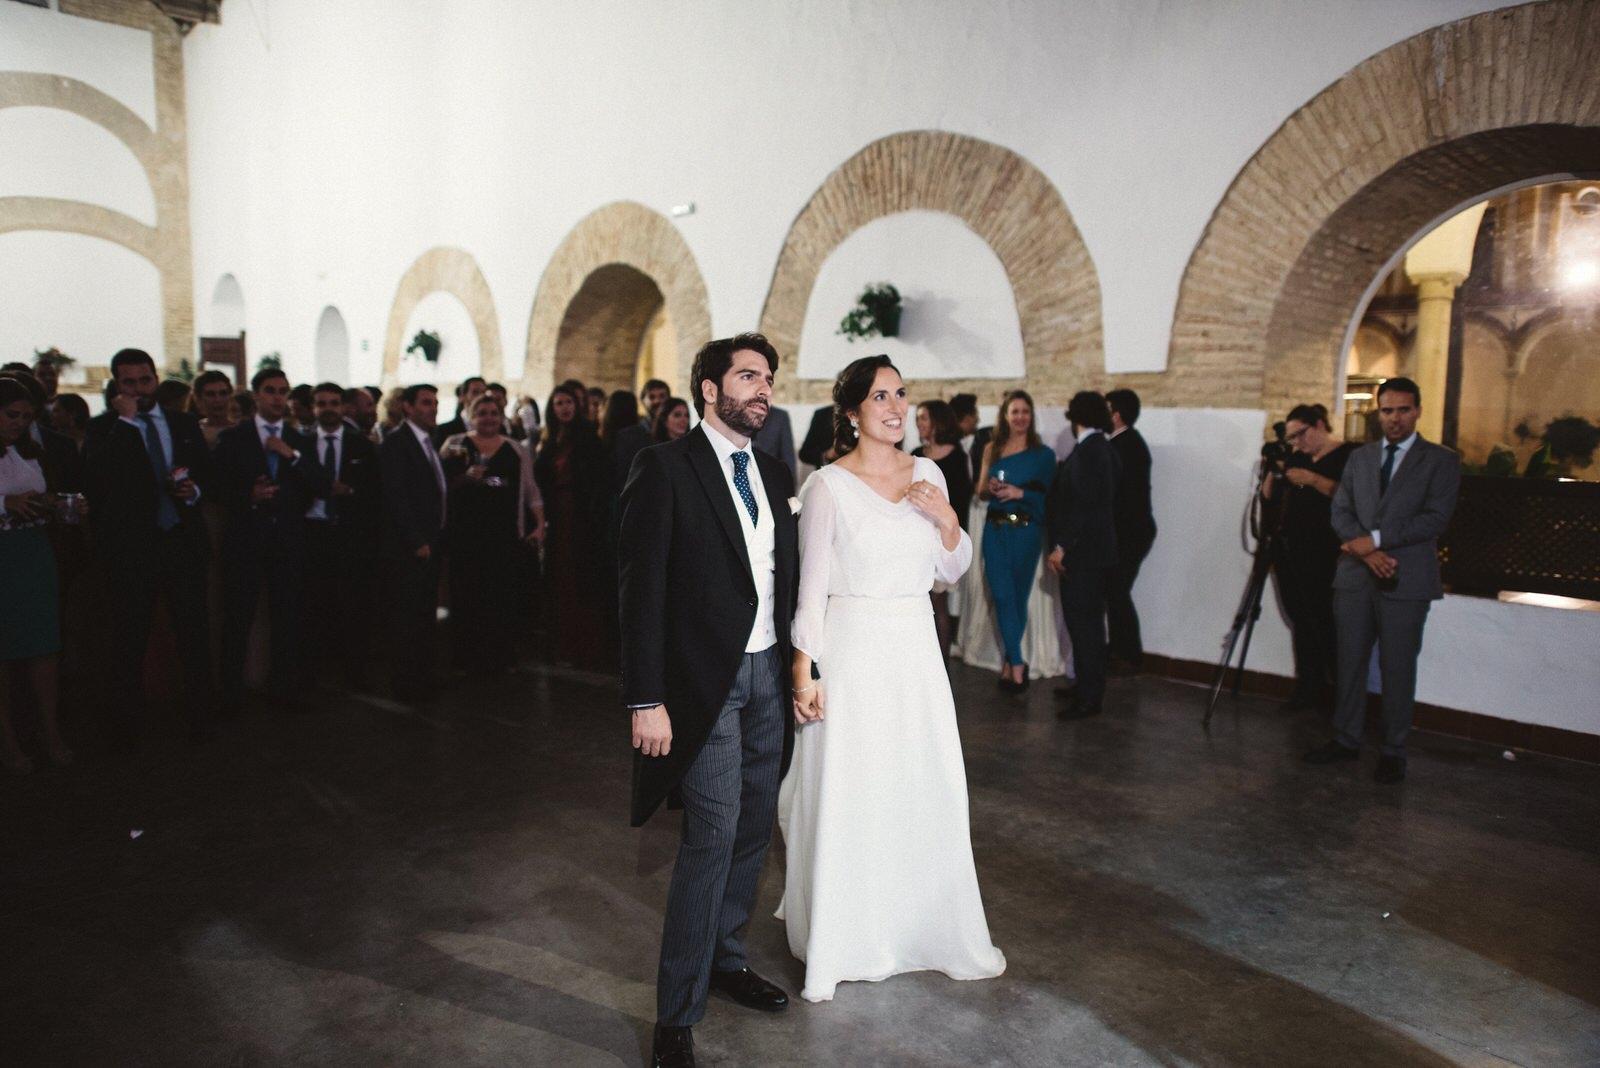 fotografo de bodas sevilla - fotografo boda - fotografía sevilla - Andrés AmarilloAAA_3666- fine.JPG